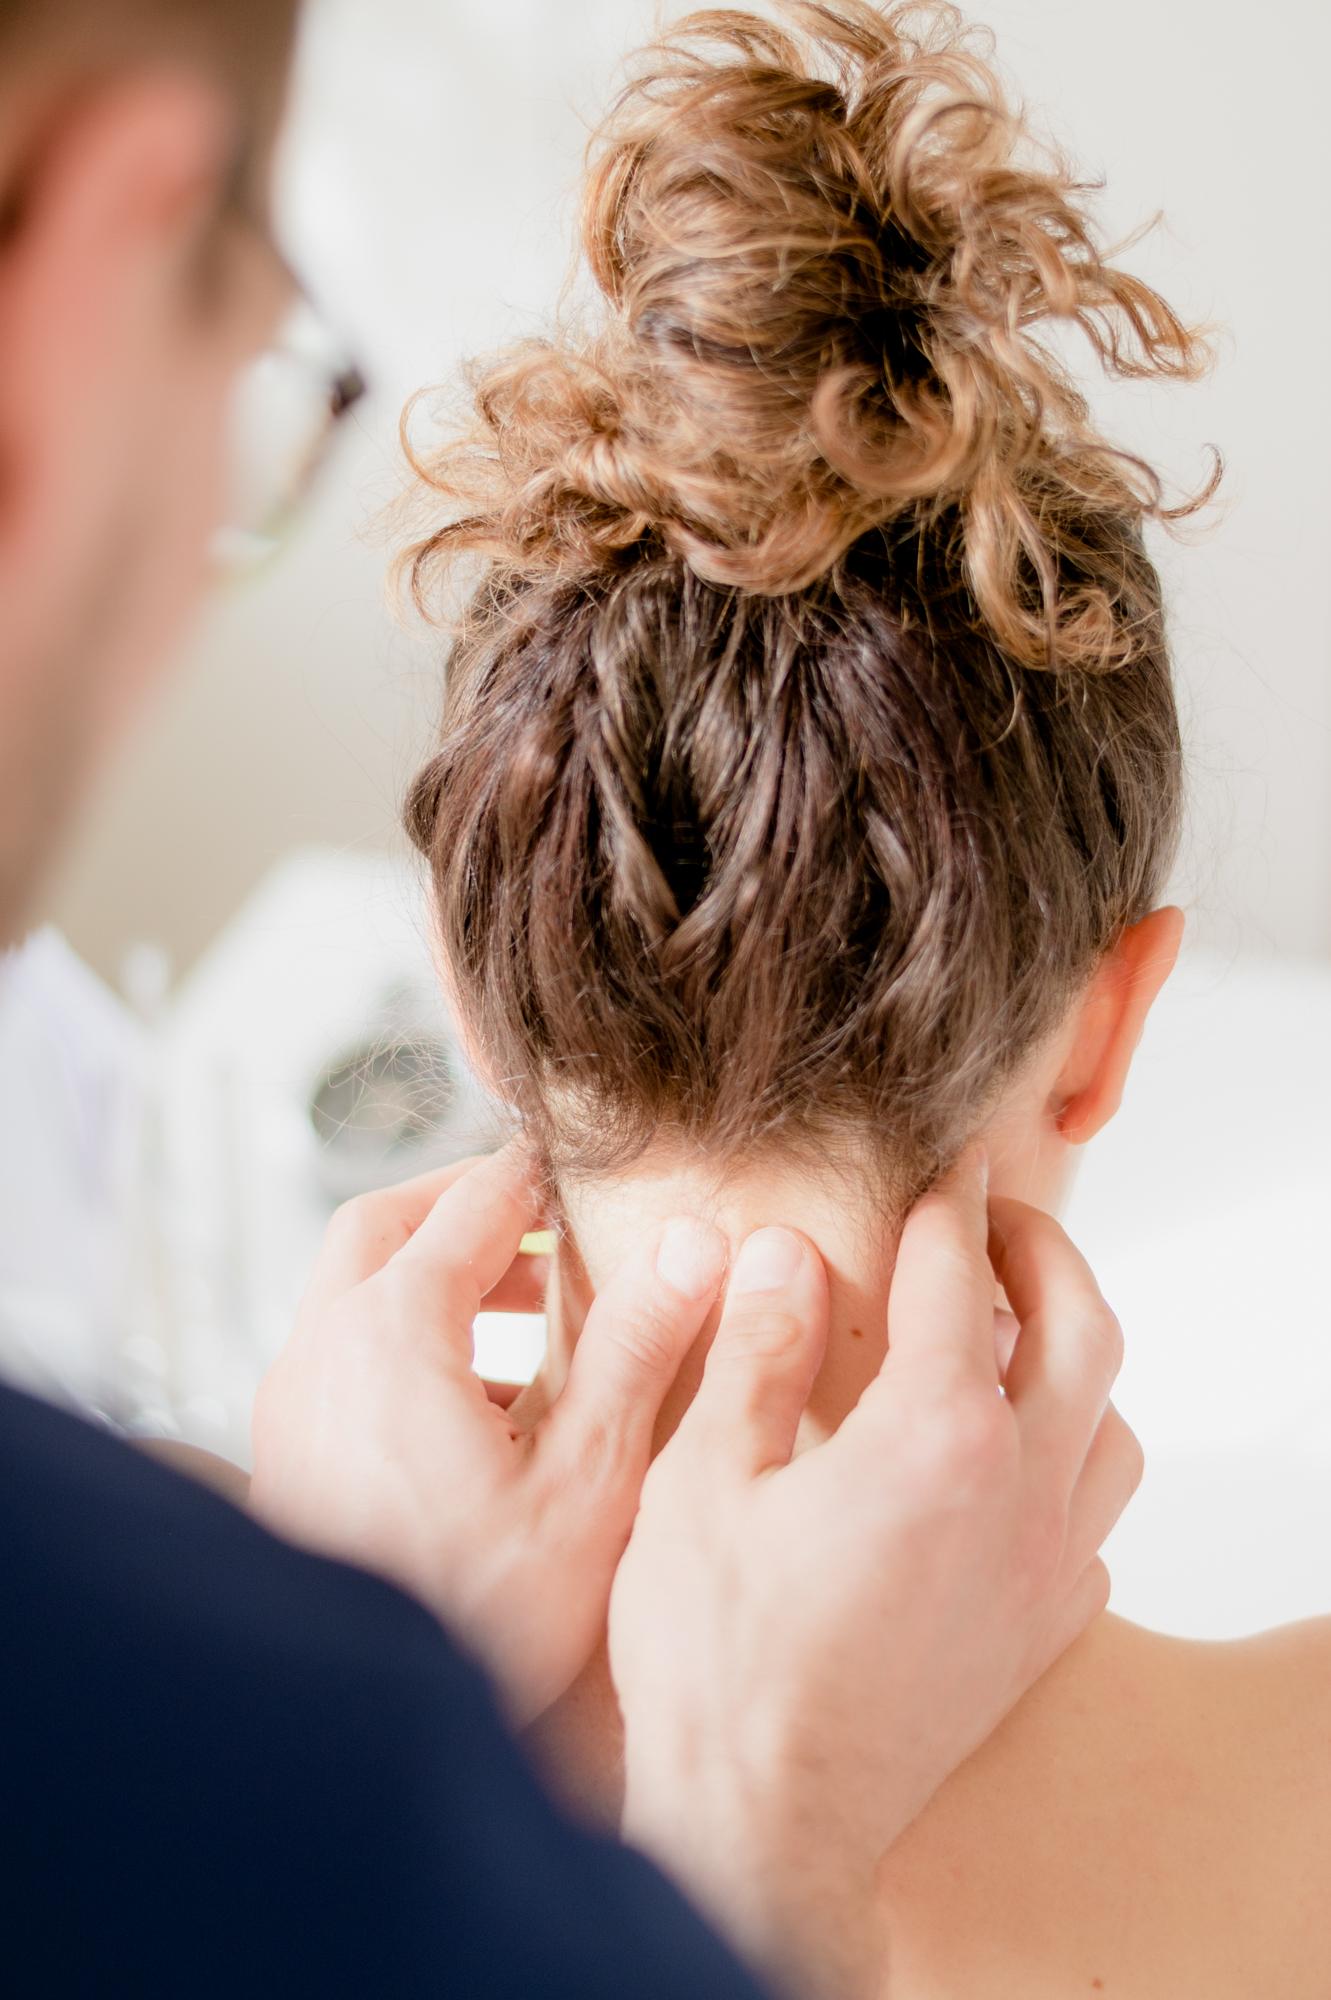 Klassische Osteopathie Behandlung